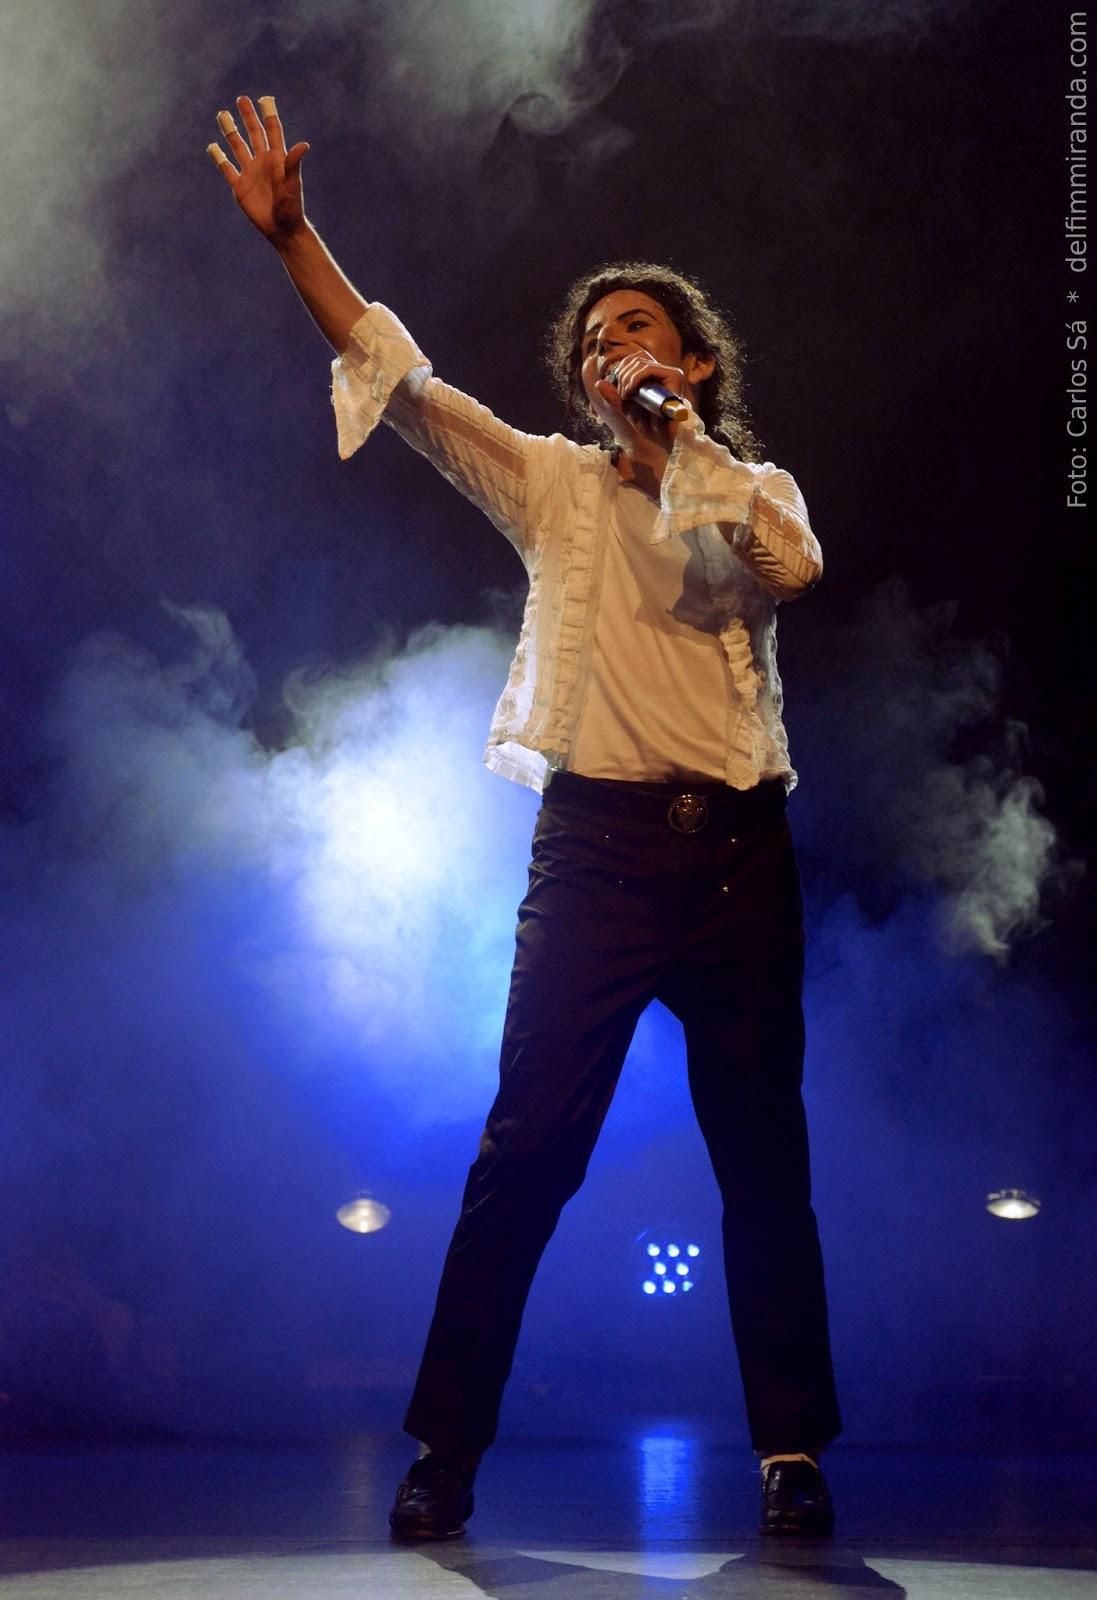 Delfim Miranda - Michael Jackson Tribute - Slow - Live on Stage